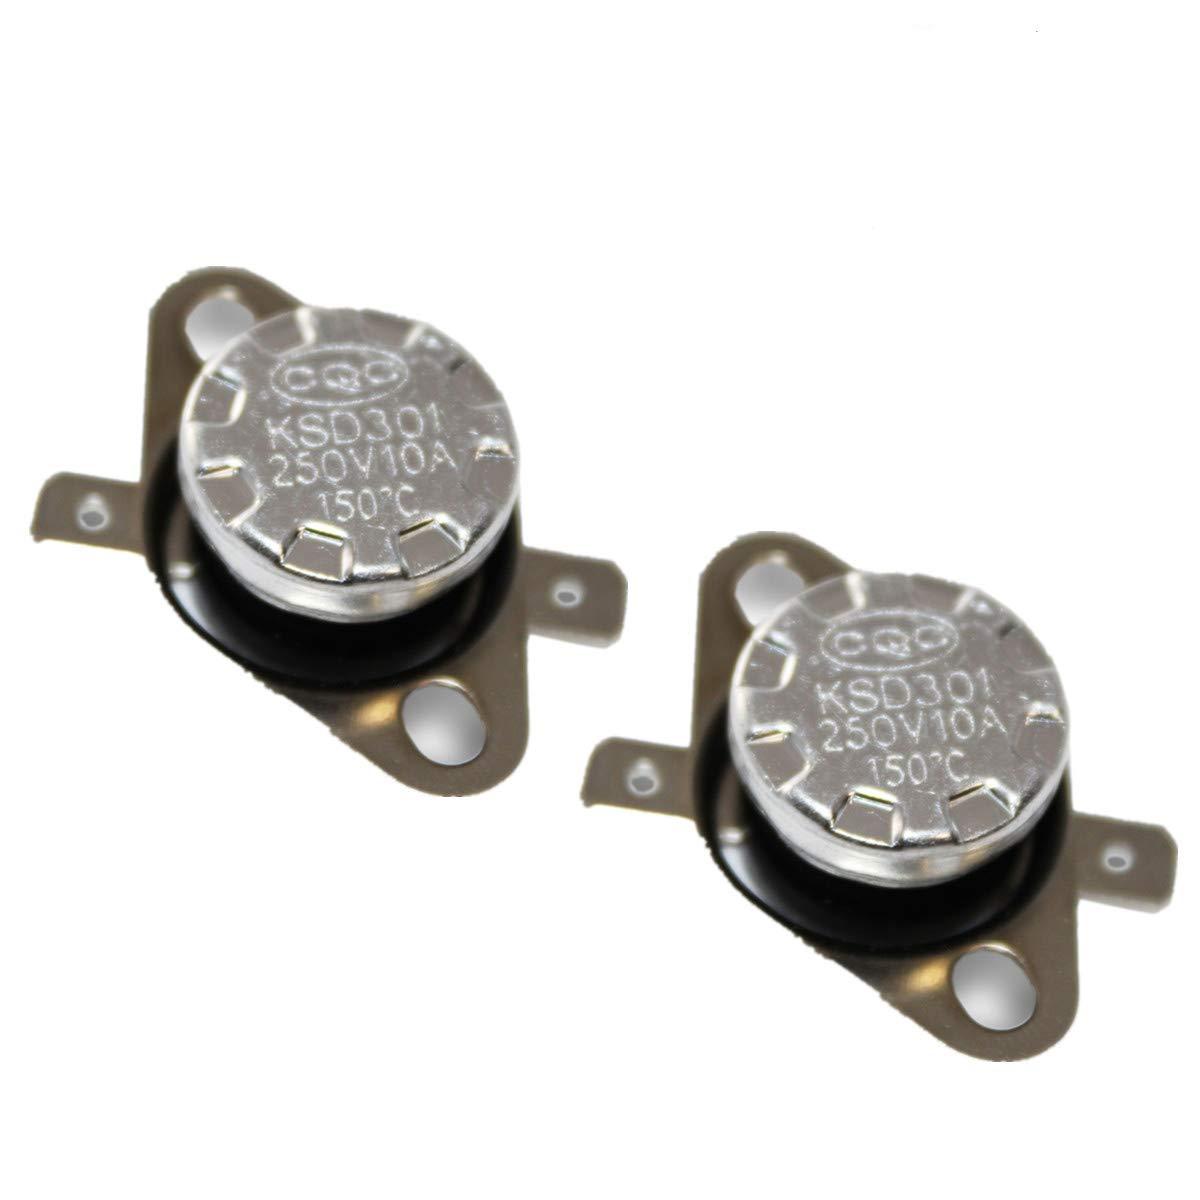 10 Pcs KSD301 250V 10A 115 Celsius Normal Close Temperature Controlled Switch